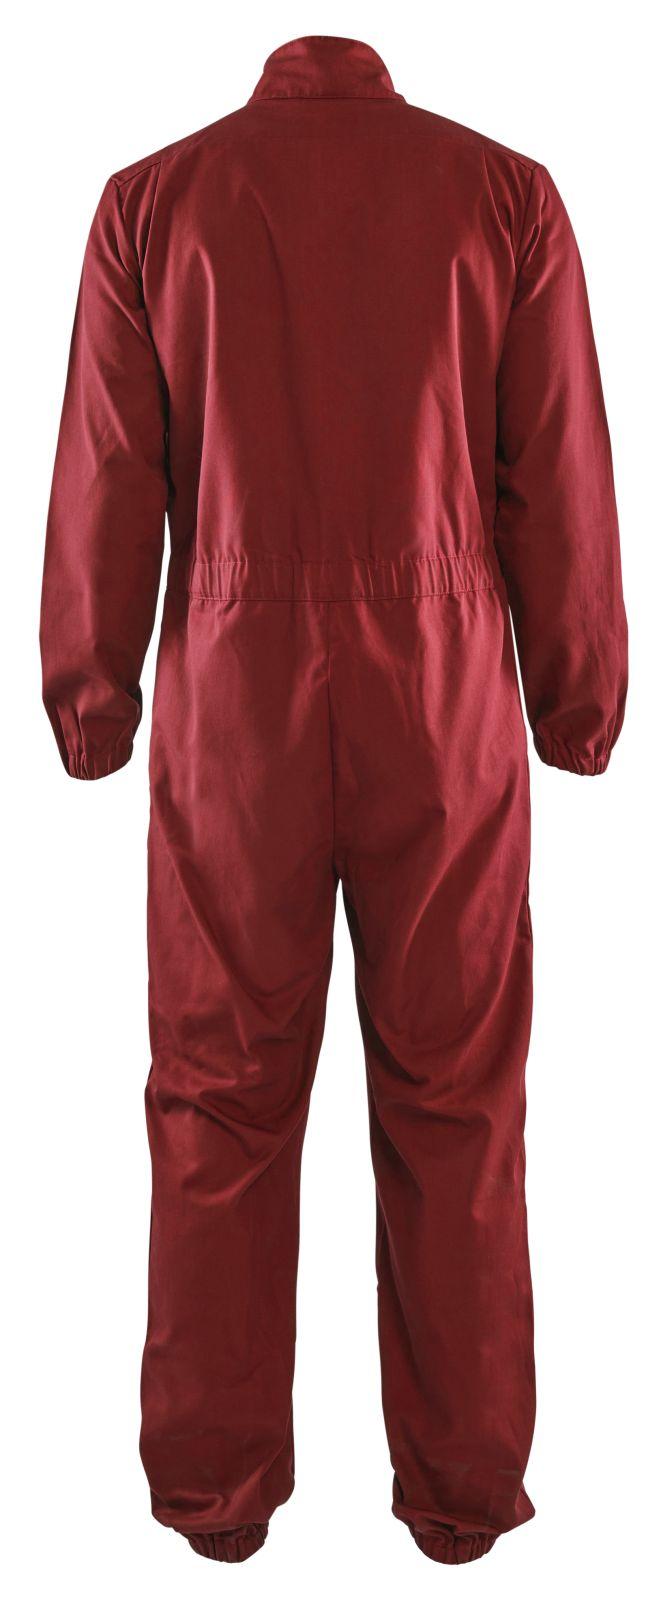 Blaklader overalls 61201800 rood(5600)